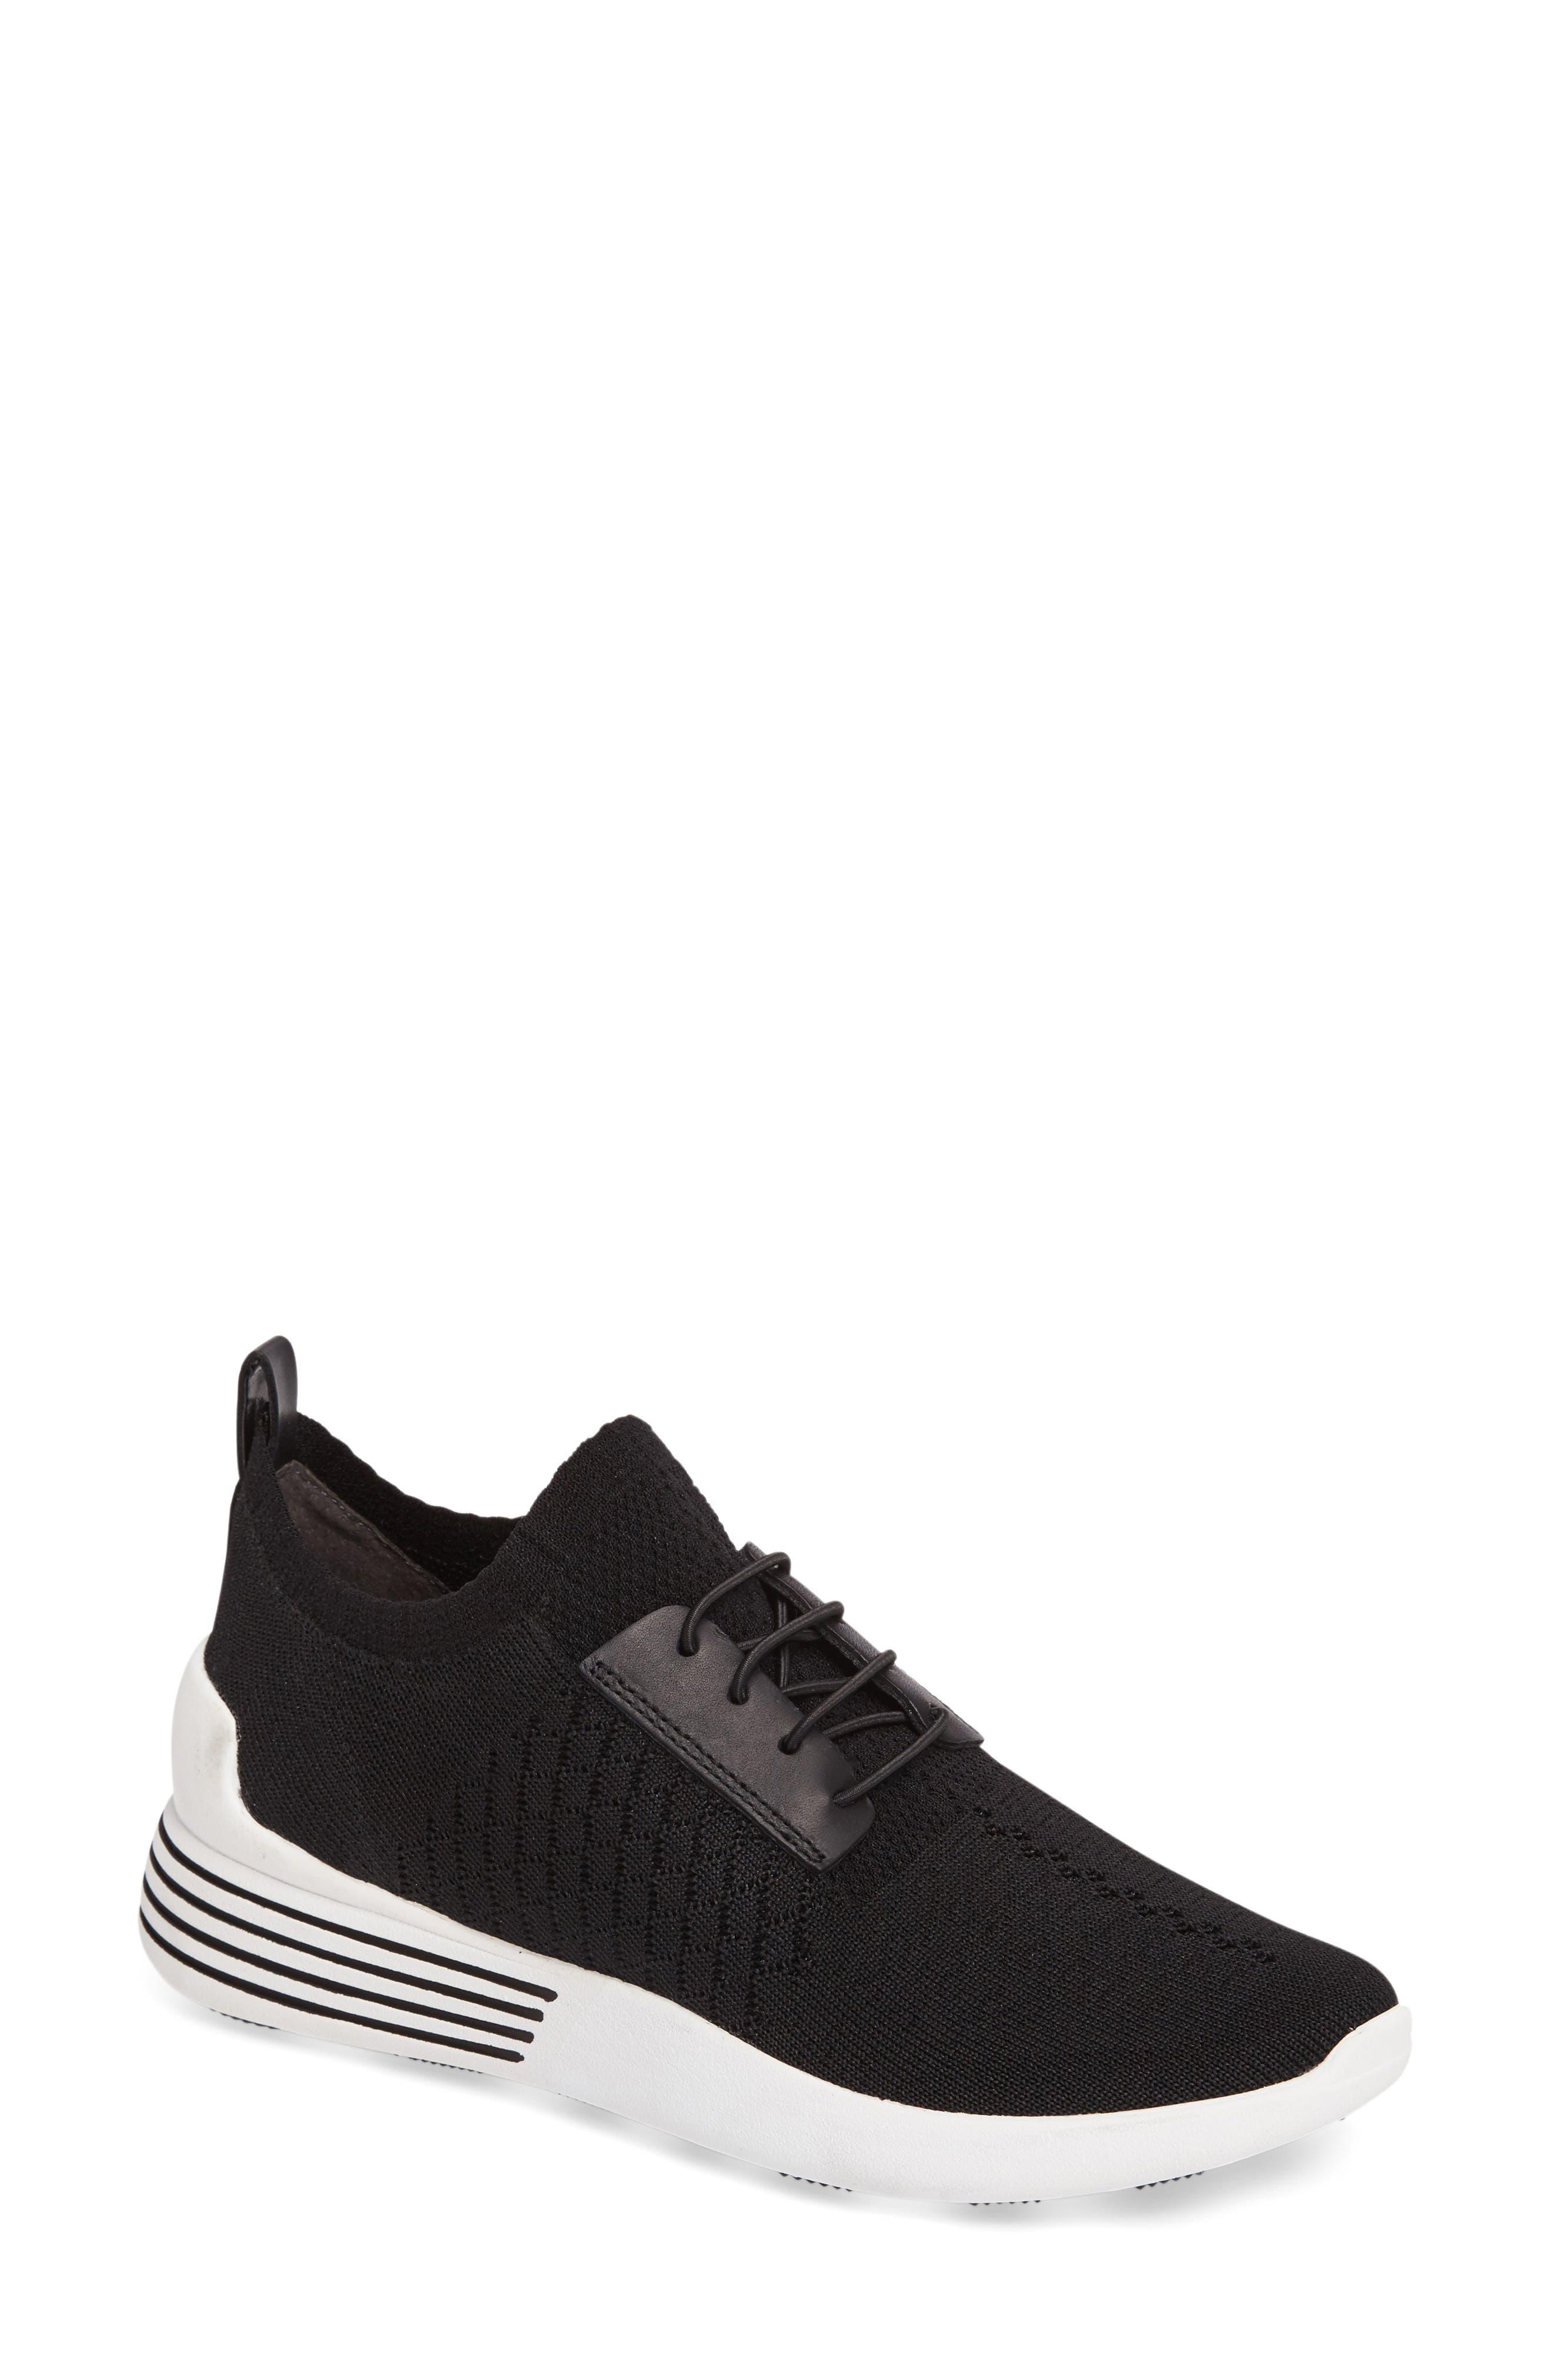 Brandy Woven Sneaker,                         Main,                         color, Black/ Black Fabric